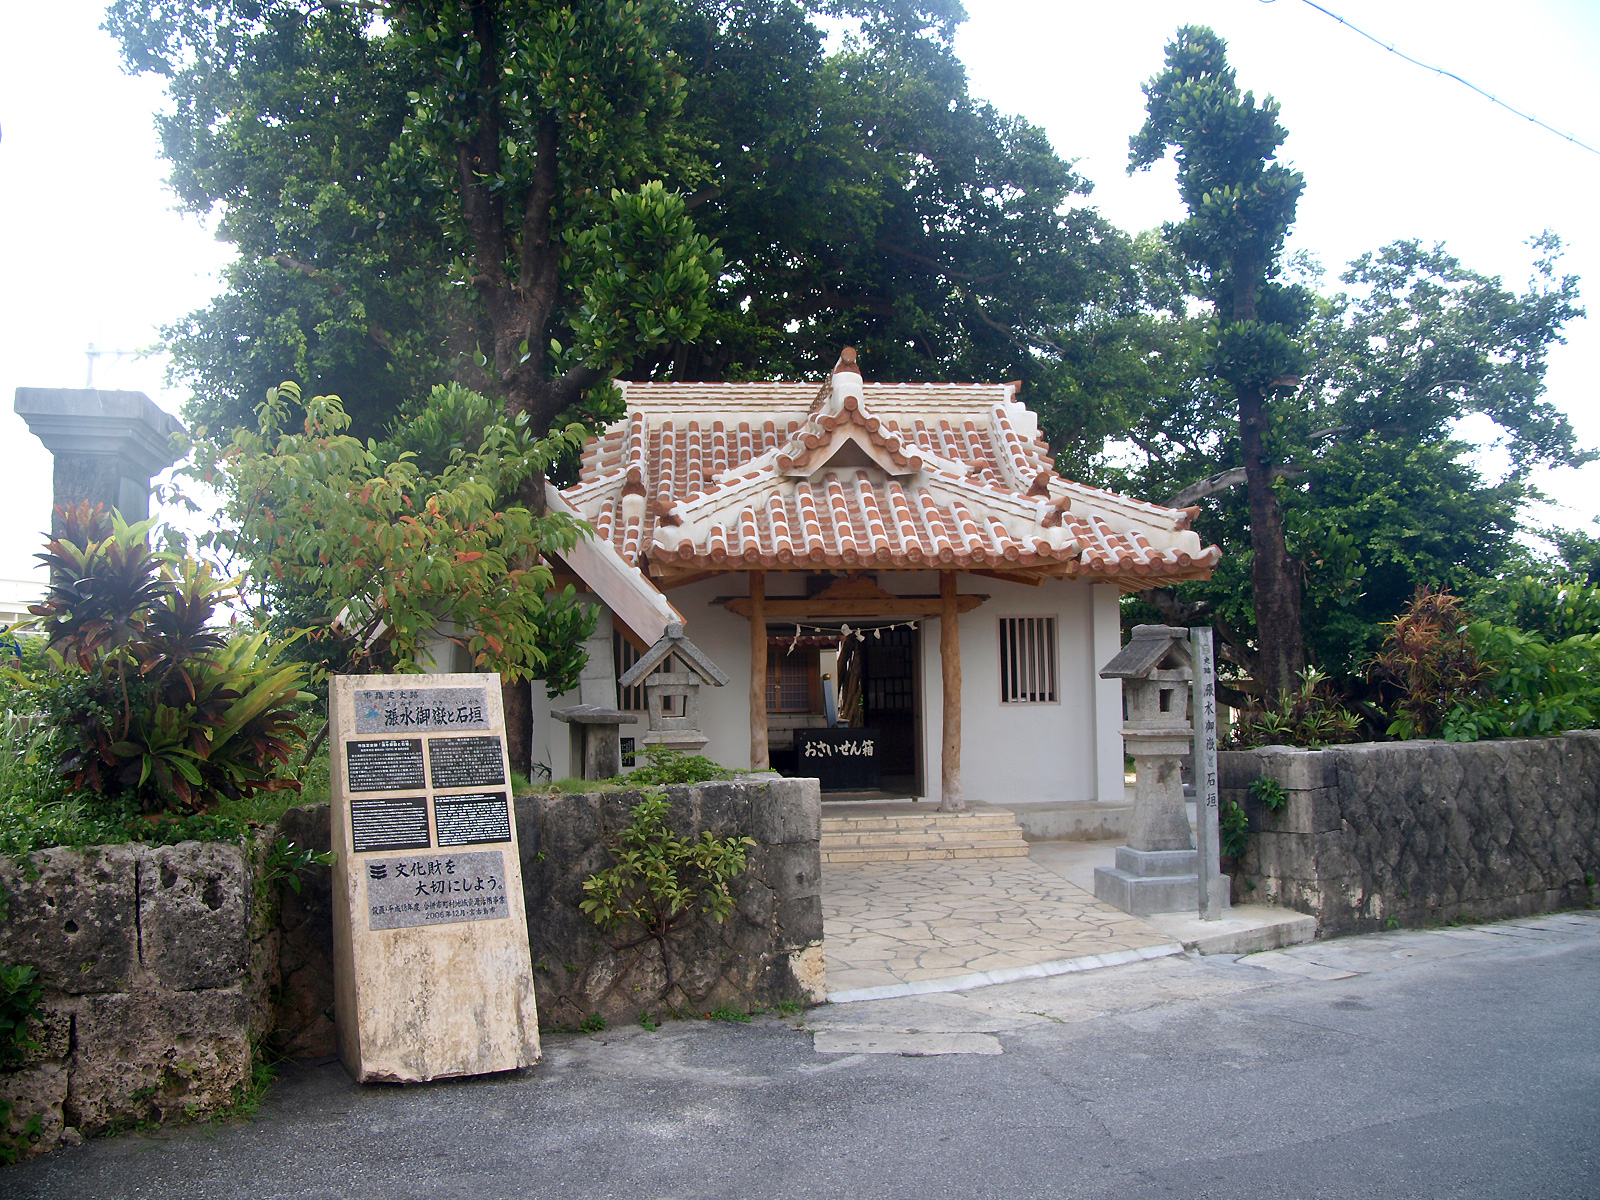 Ryukyuan religion - Wikipedia